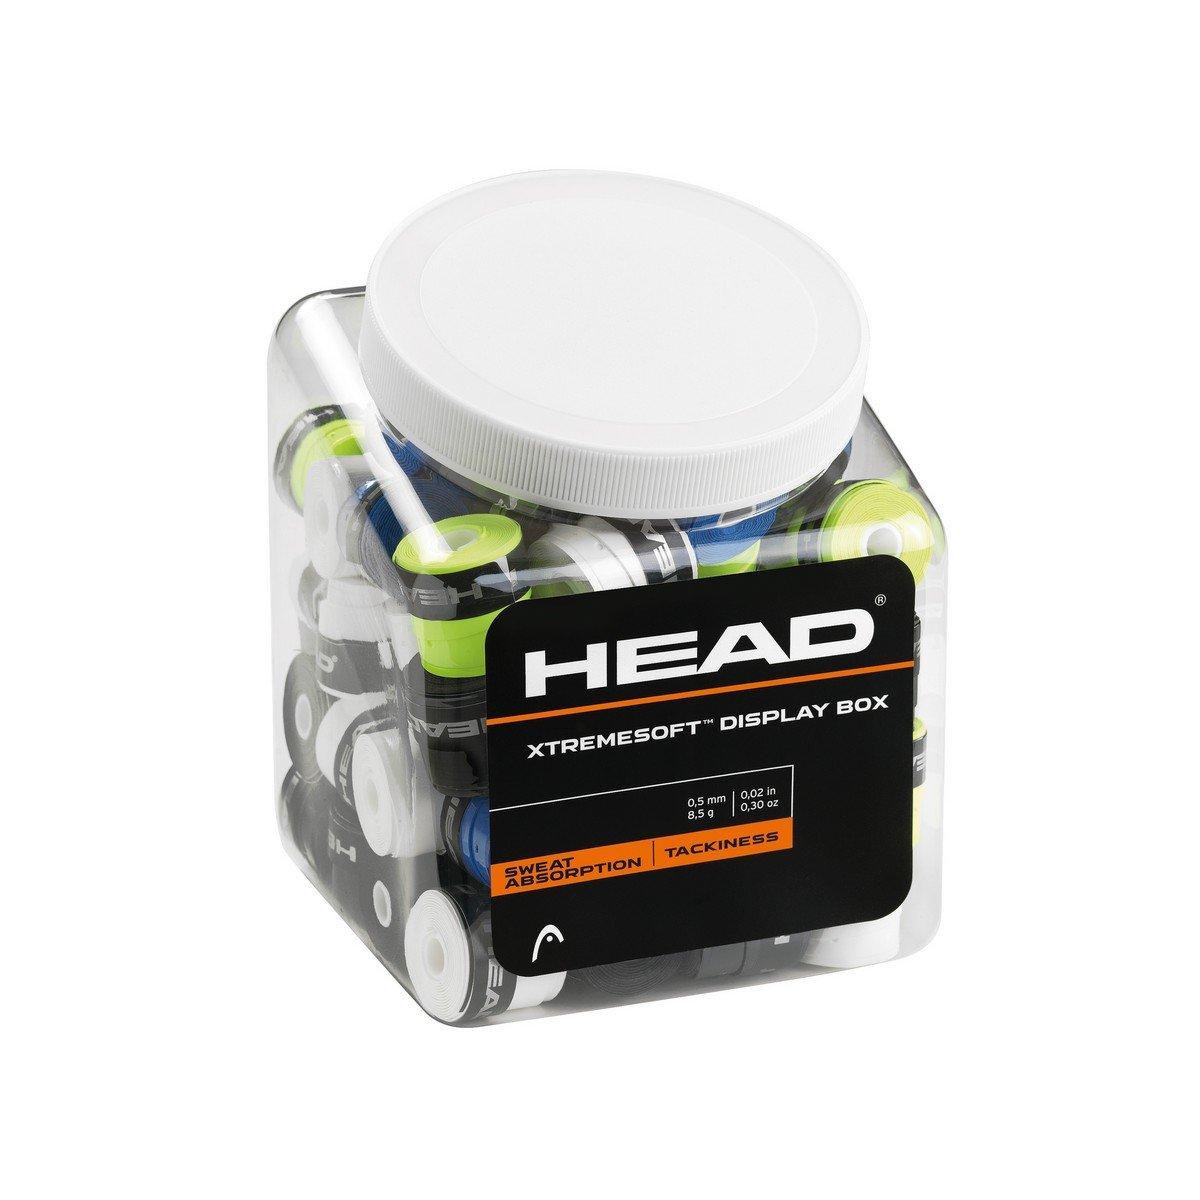 Head Xtremesoft Display Box Pack de Overgrip, Unisex Adulto, Negro, S: Amazon.es: Deportes y aire libre